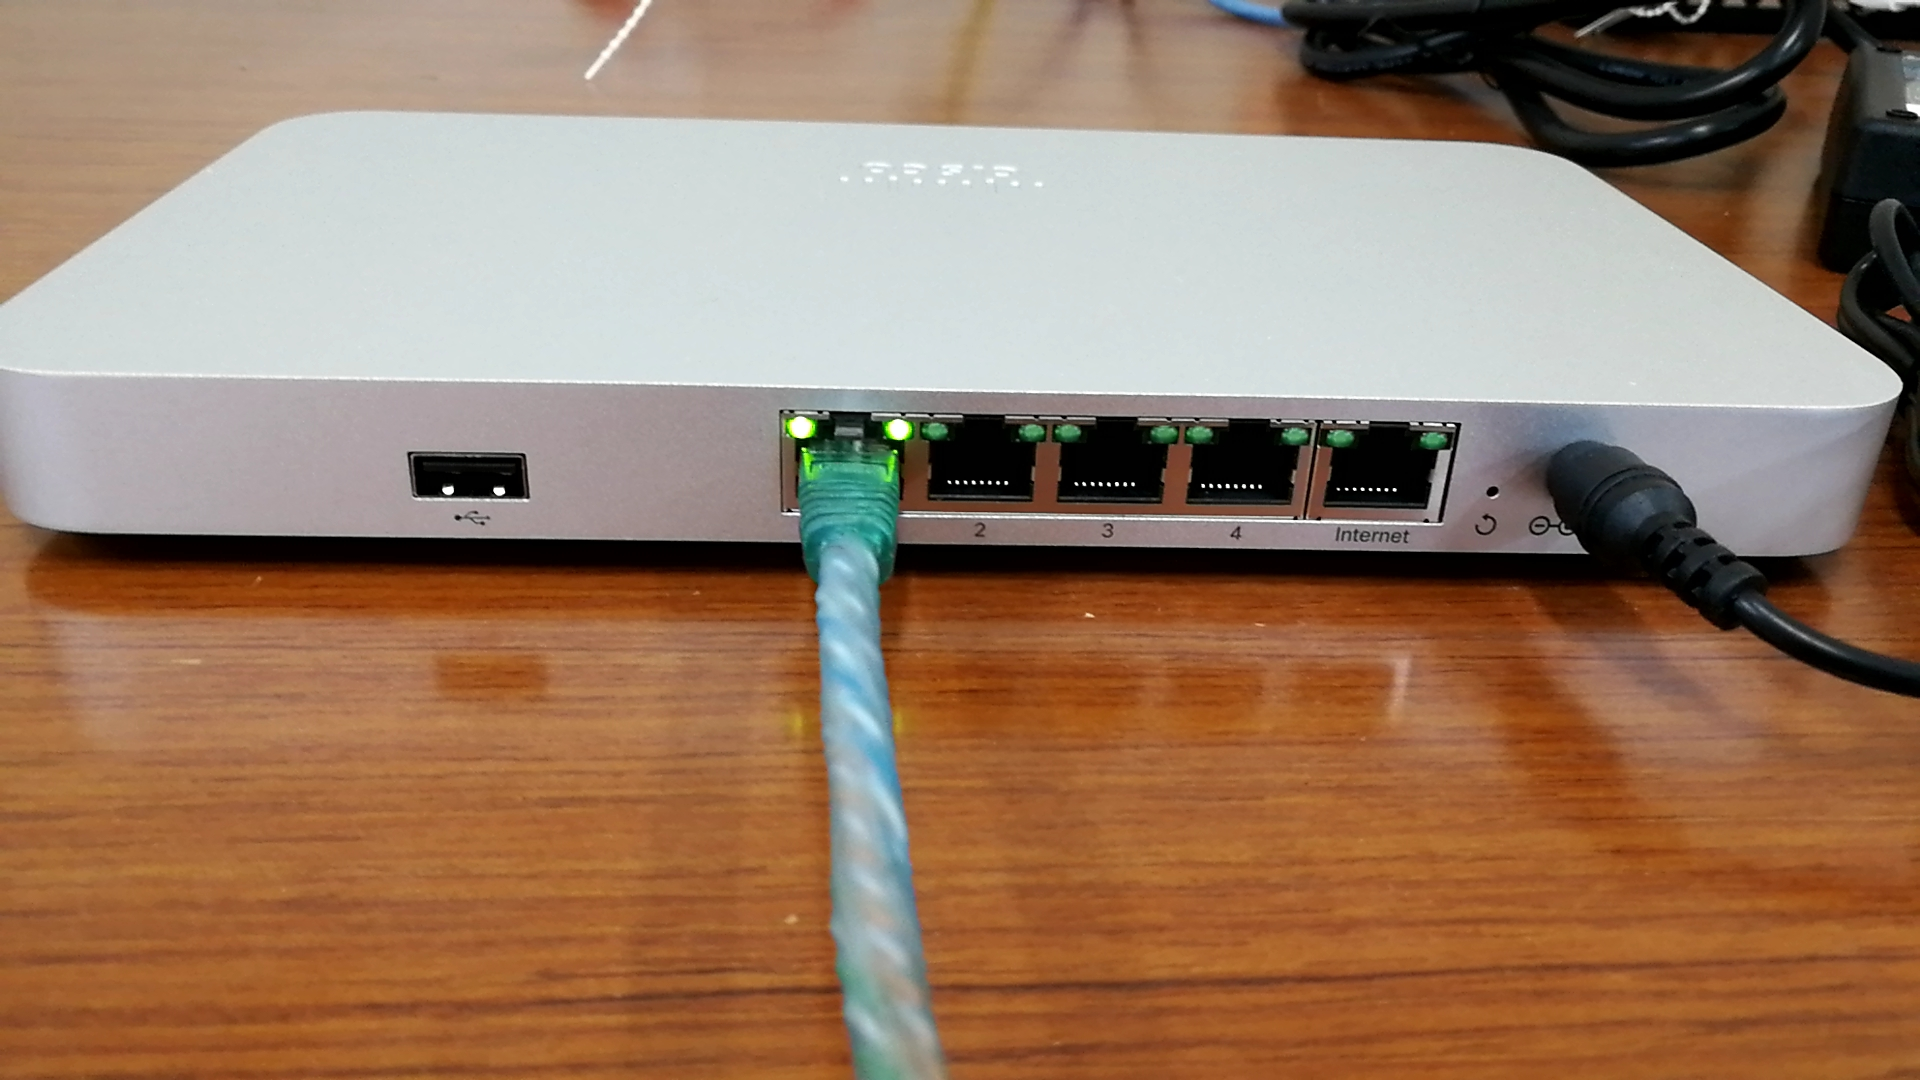 cisco meraki ルータ mx64 初期設定編 atc構築サービス ネットワーク